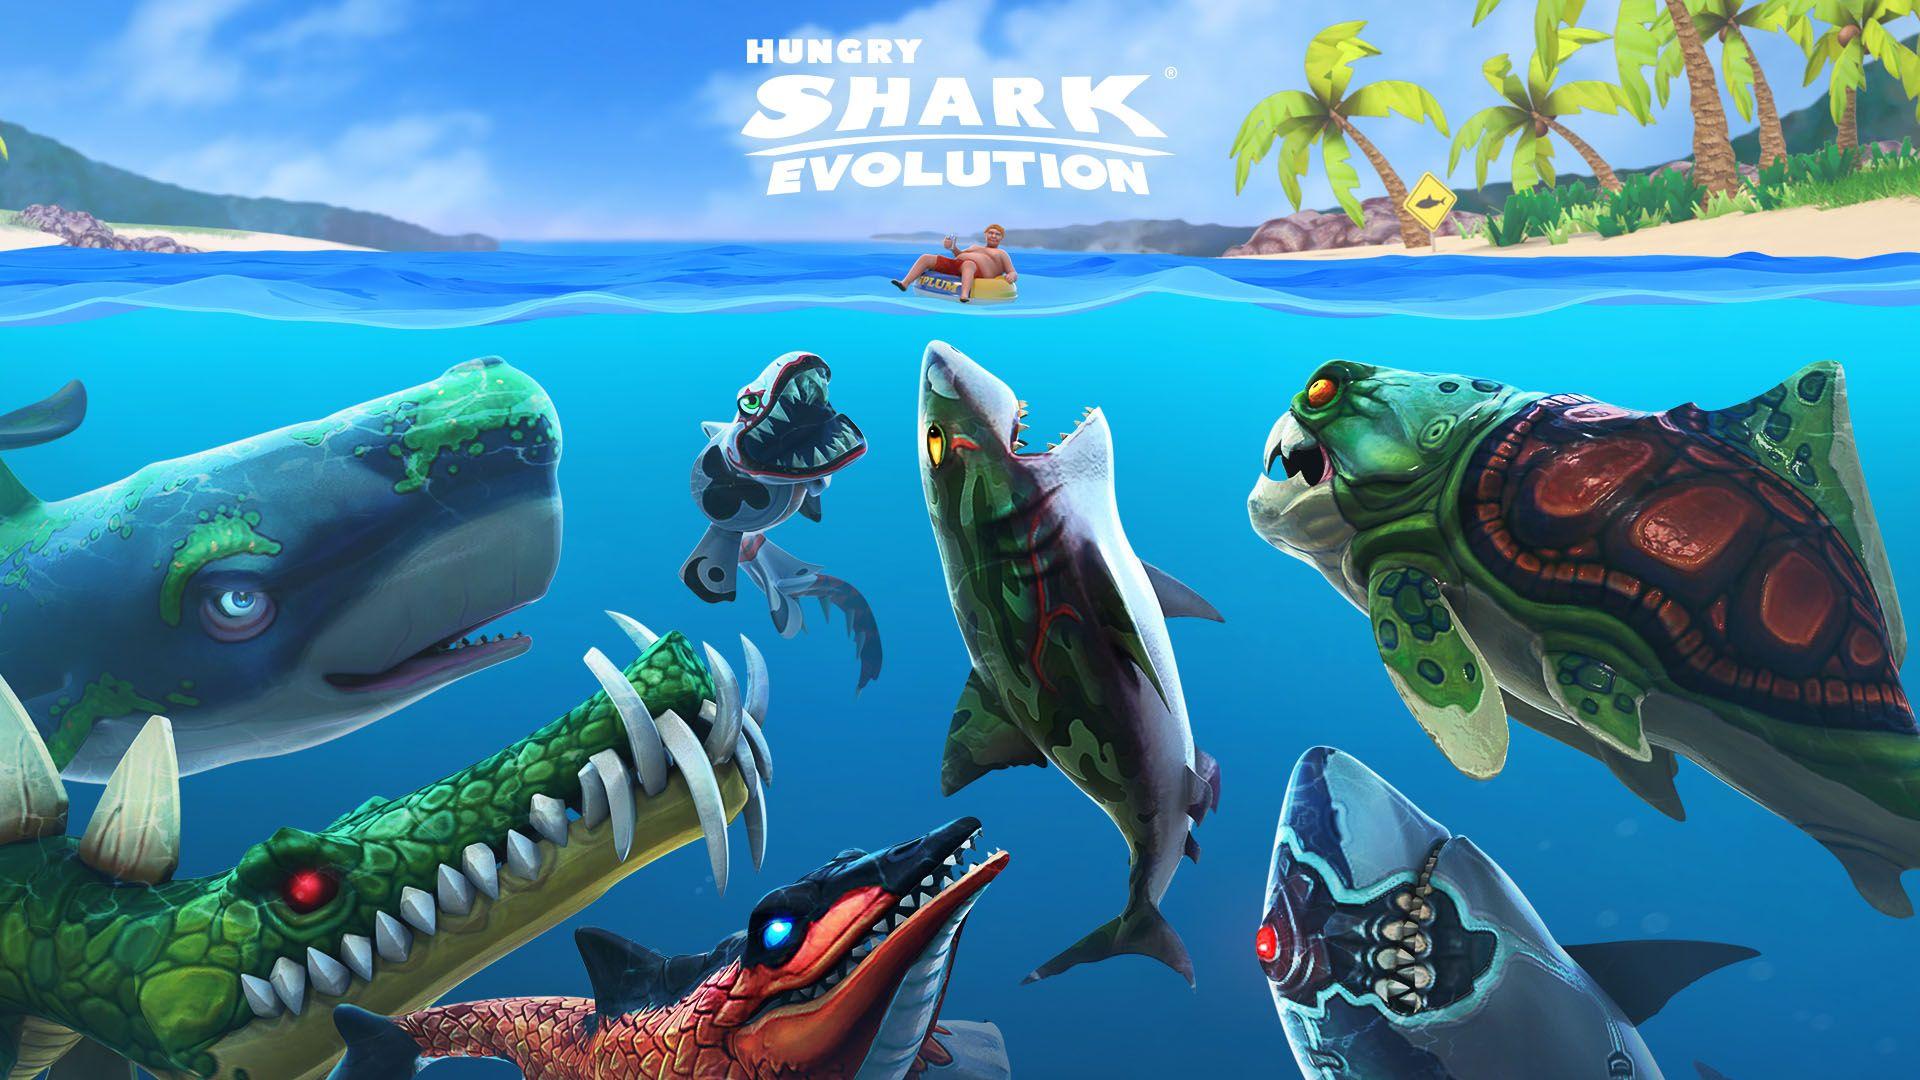 Hungry Shark MOD Apk